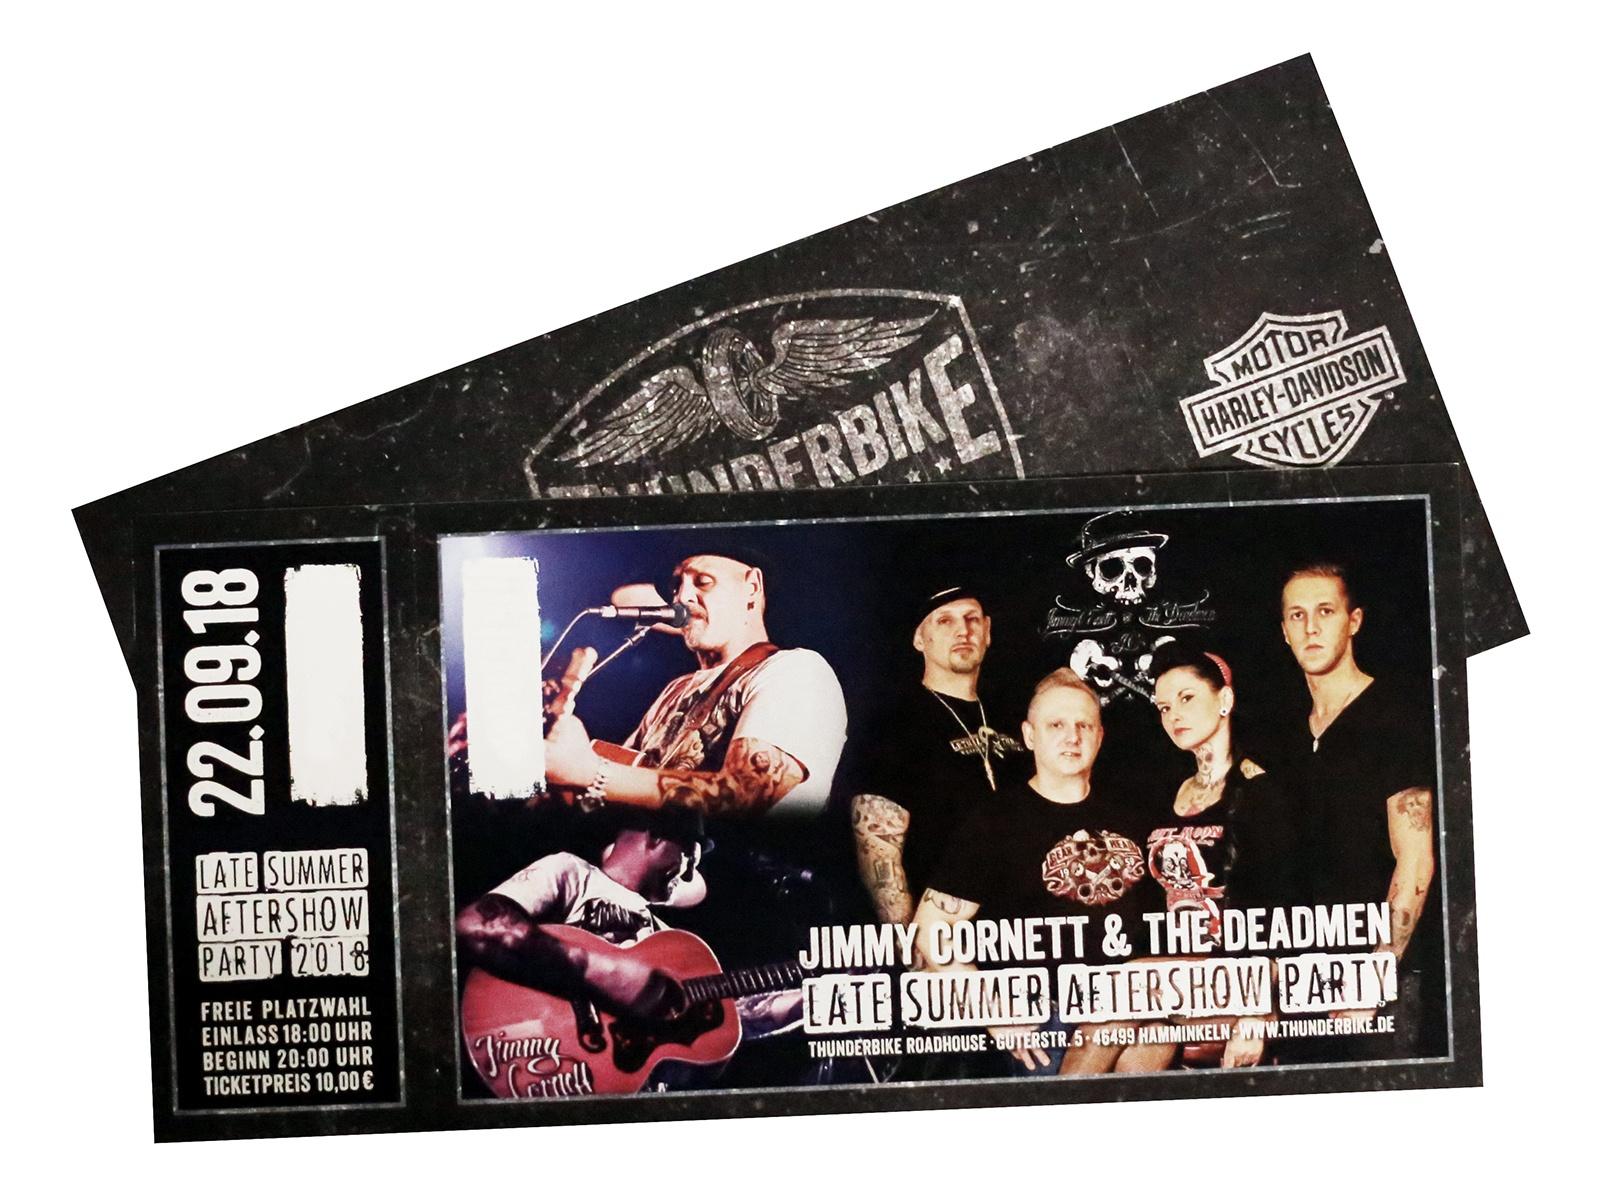 Konzertkarte Late Summer 22.09.18 mit Jimmy Cornett